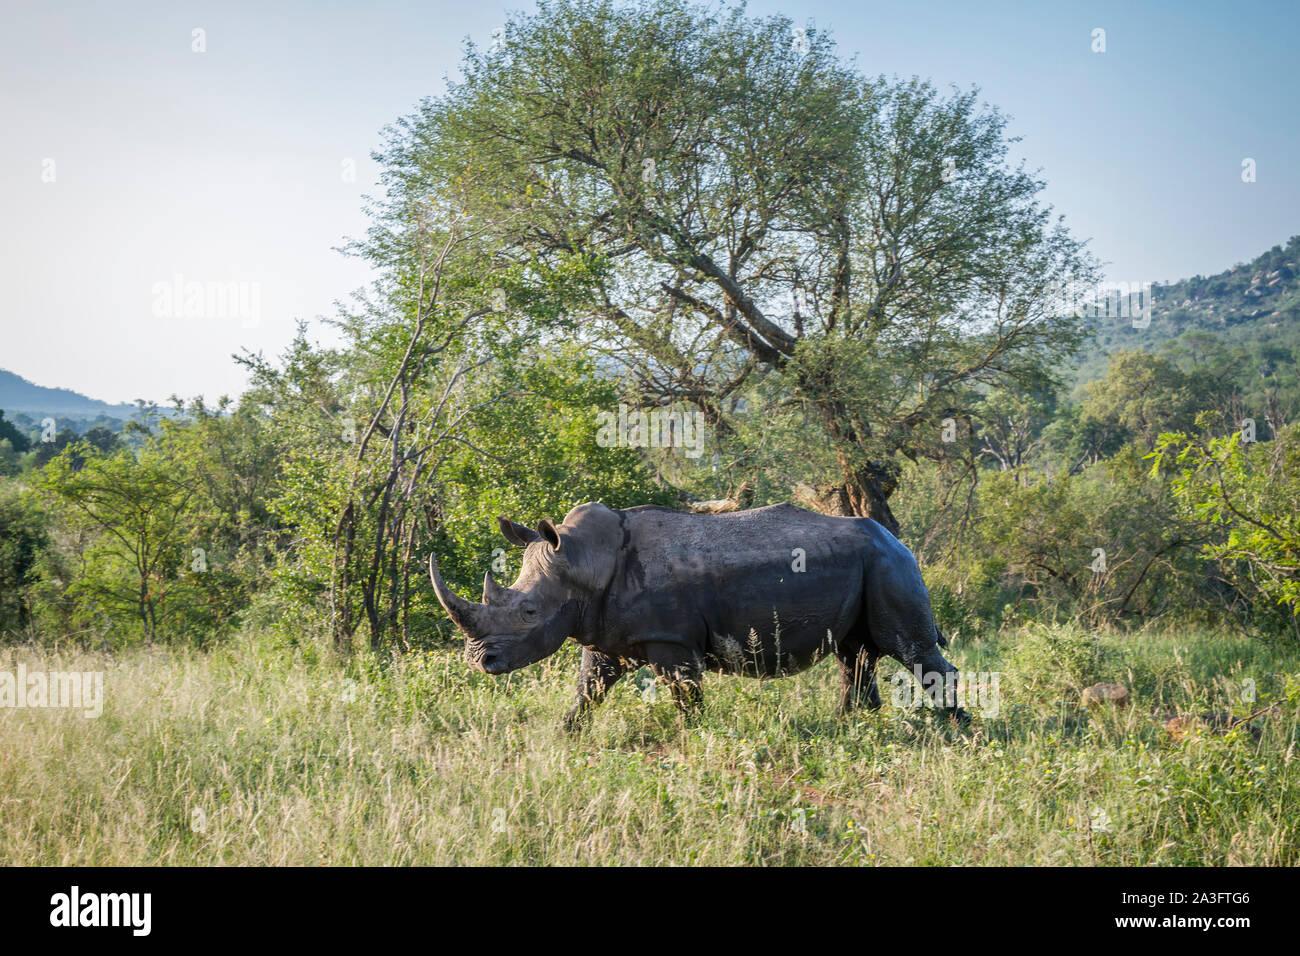 Southern white rhinoceros in green savannah in Kruger National park, South Africa ; Specie Ceratotherium simum simum family of Rhinocerotidae - Stock Photo